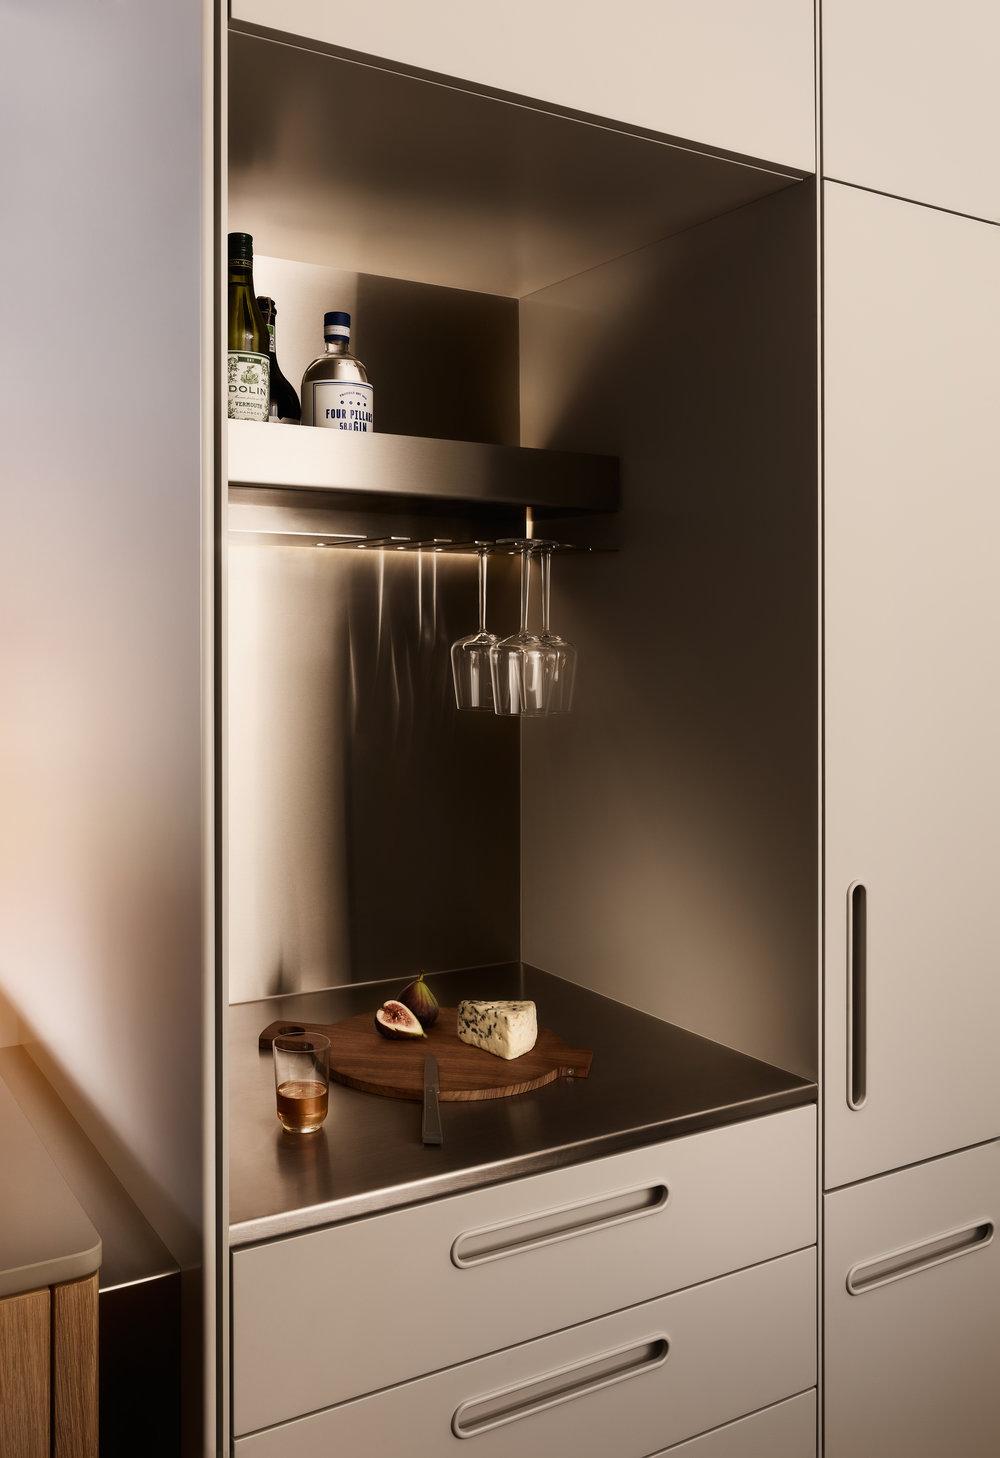 Tableau Cantilever DesignOffice Kitchen System Australia (9).jpg